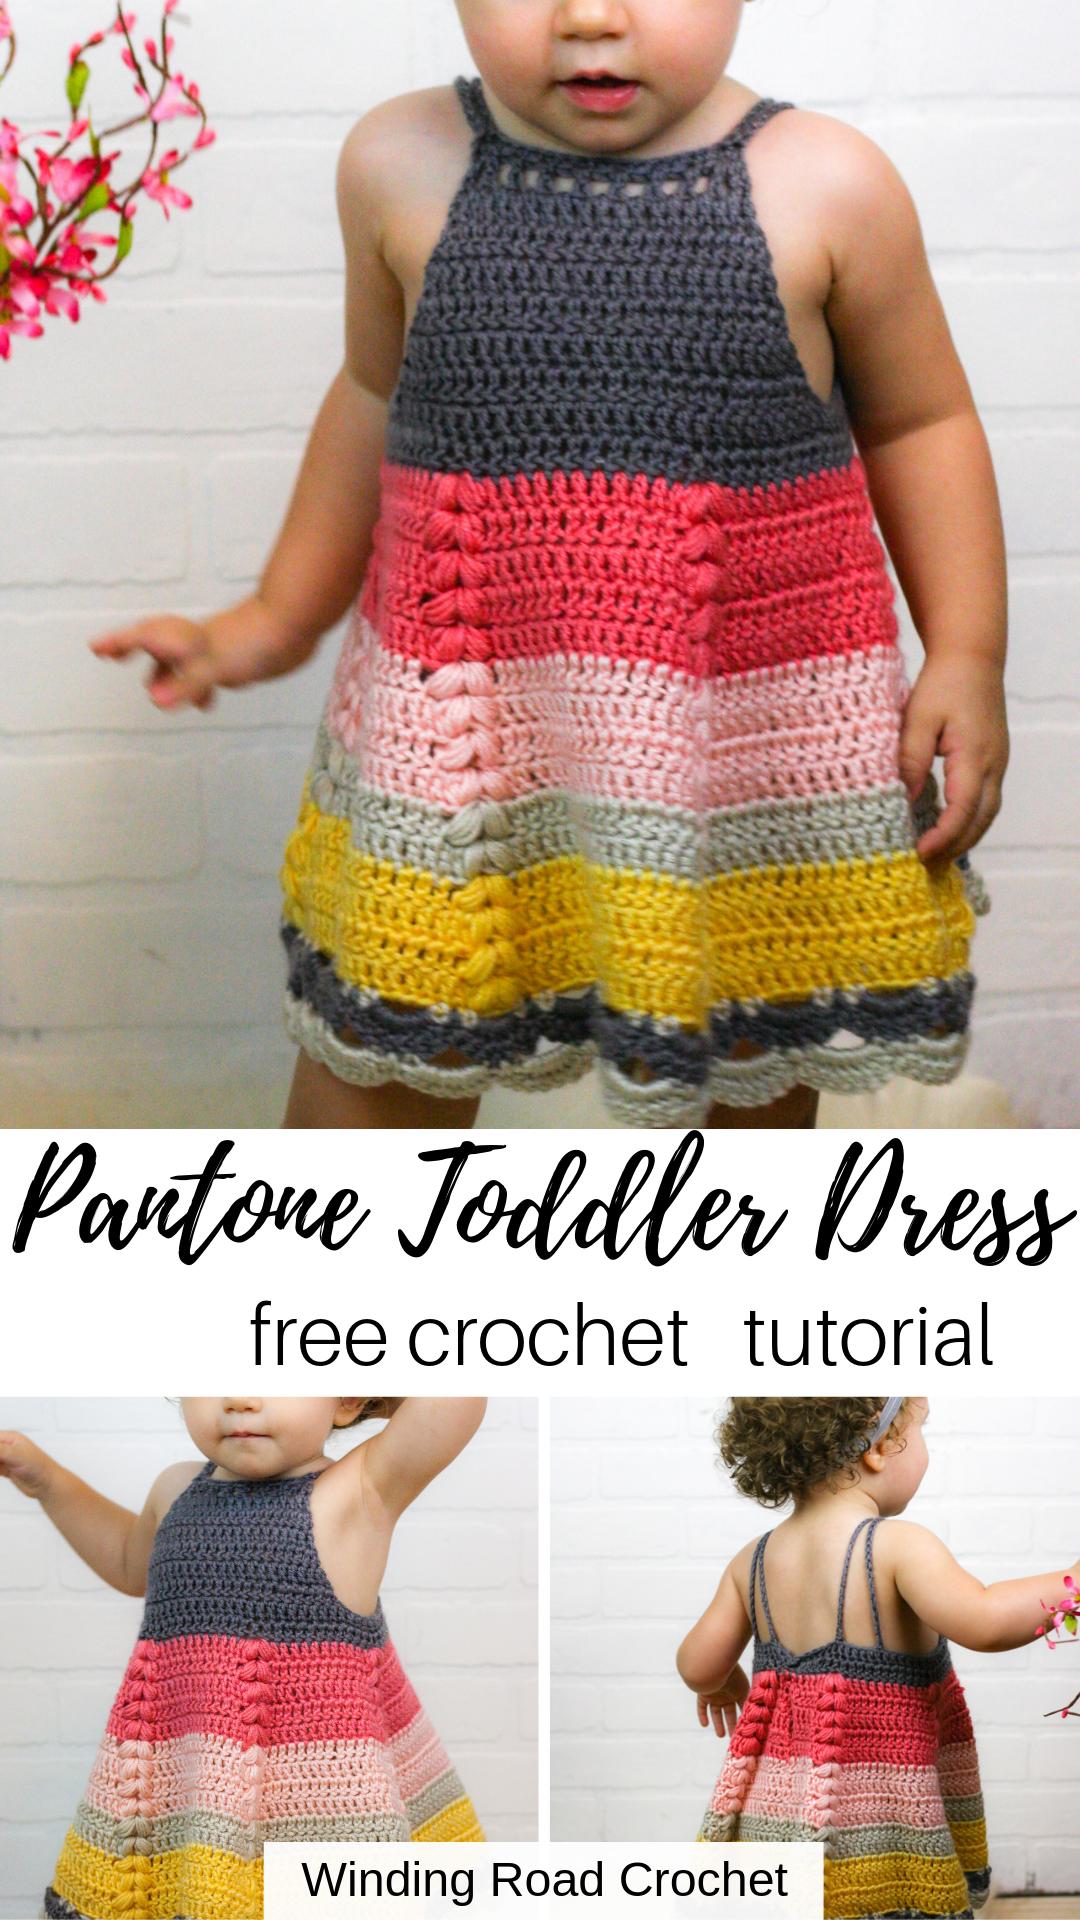 How to Crochet Toddler Dress Free Pattern - Winding Road Crochet